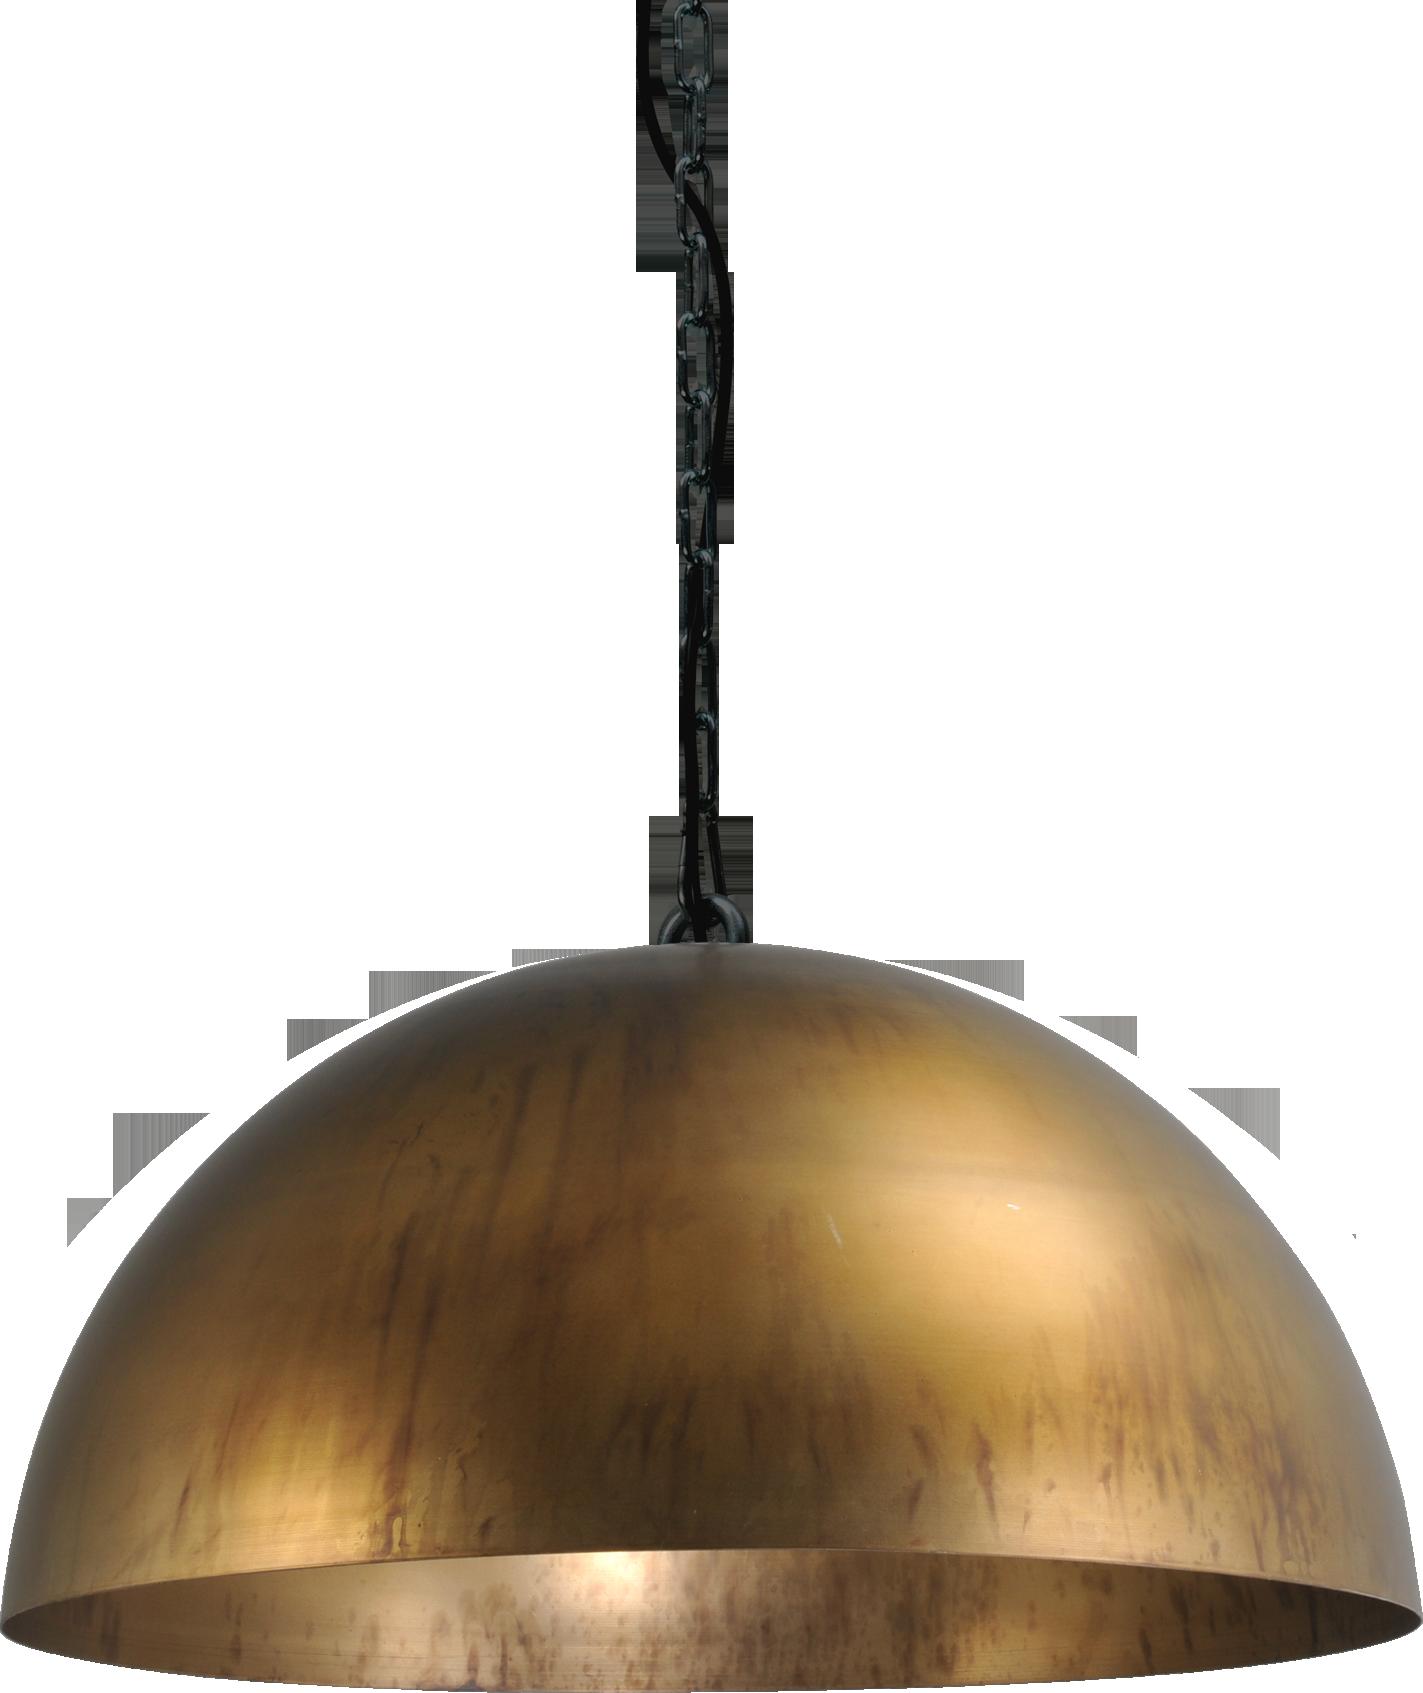 Larino Antique Brass HL LARINO Ø50CM ANTIQUE BRASS OUTSIDE